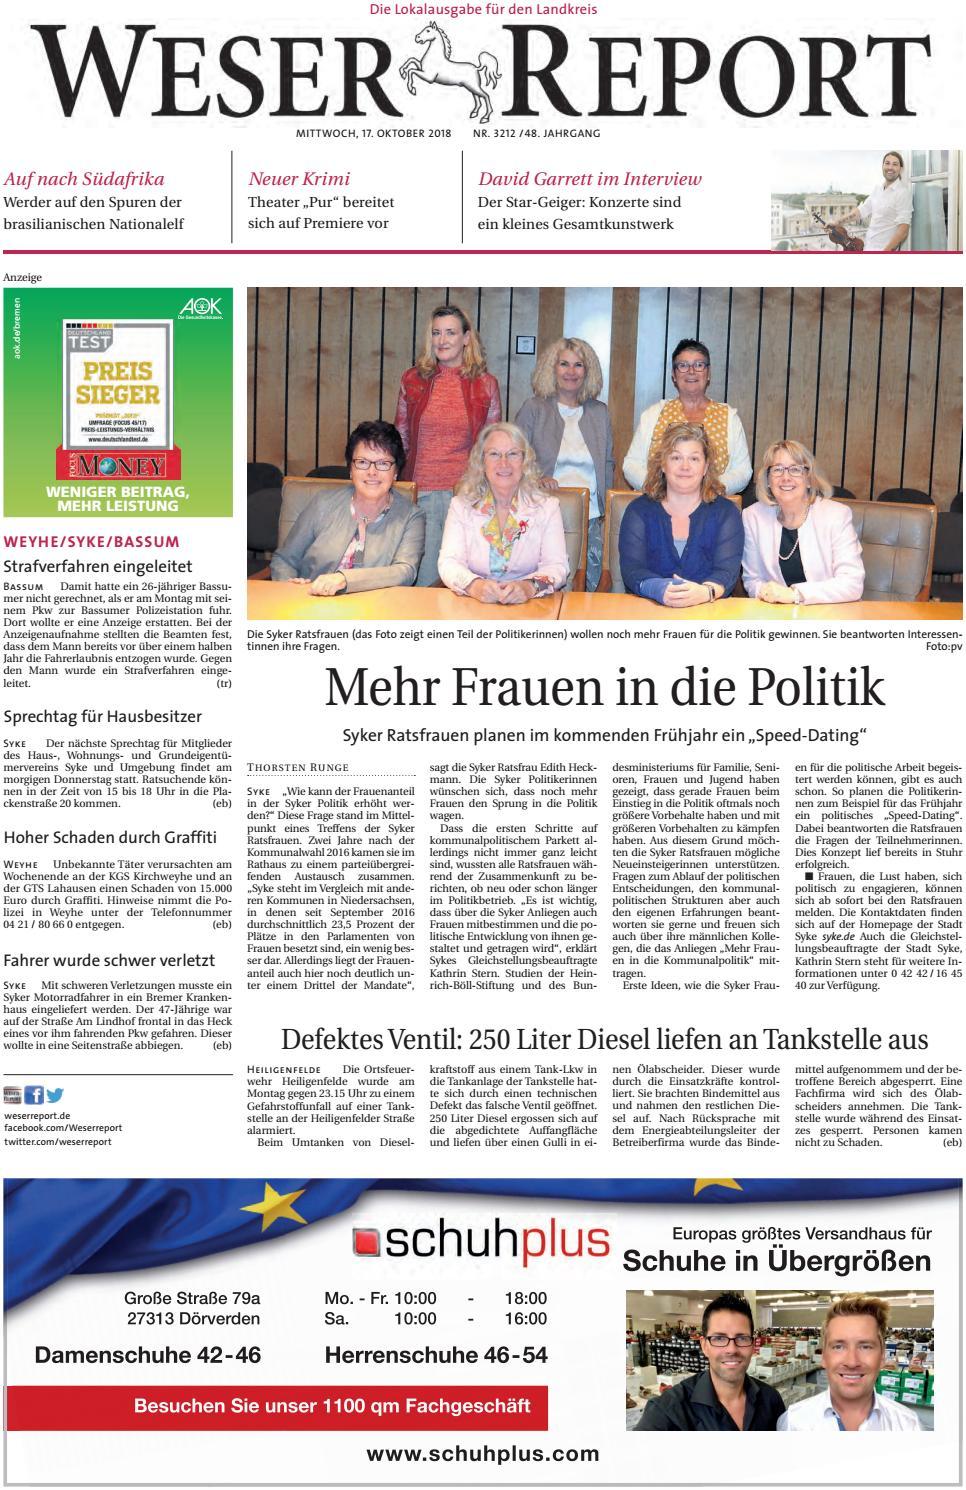 Weser Report Weyhe, Syke, Bassum vom 17.10.2018 by KPS